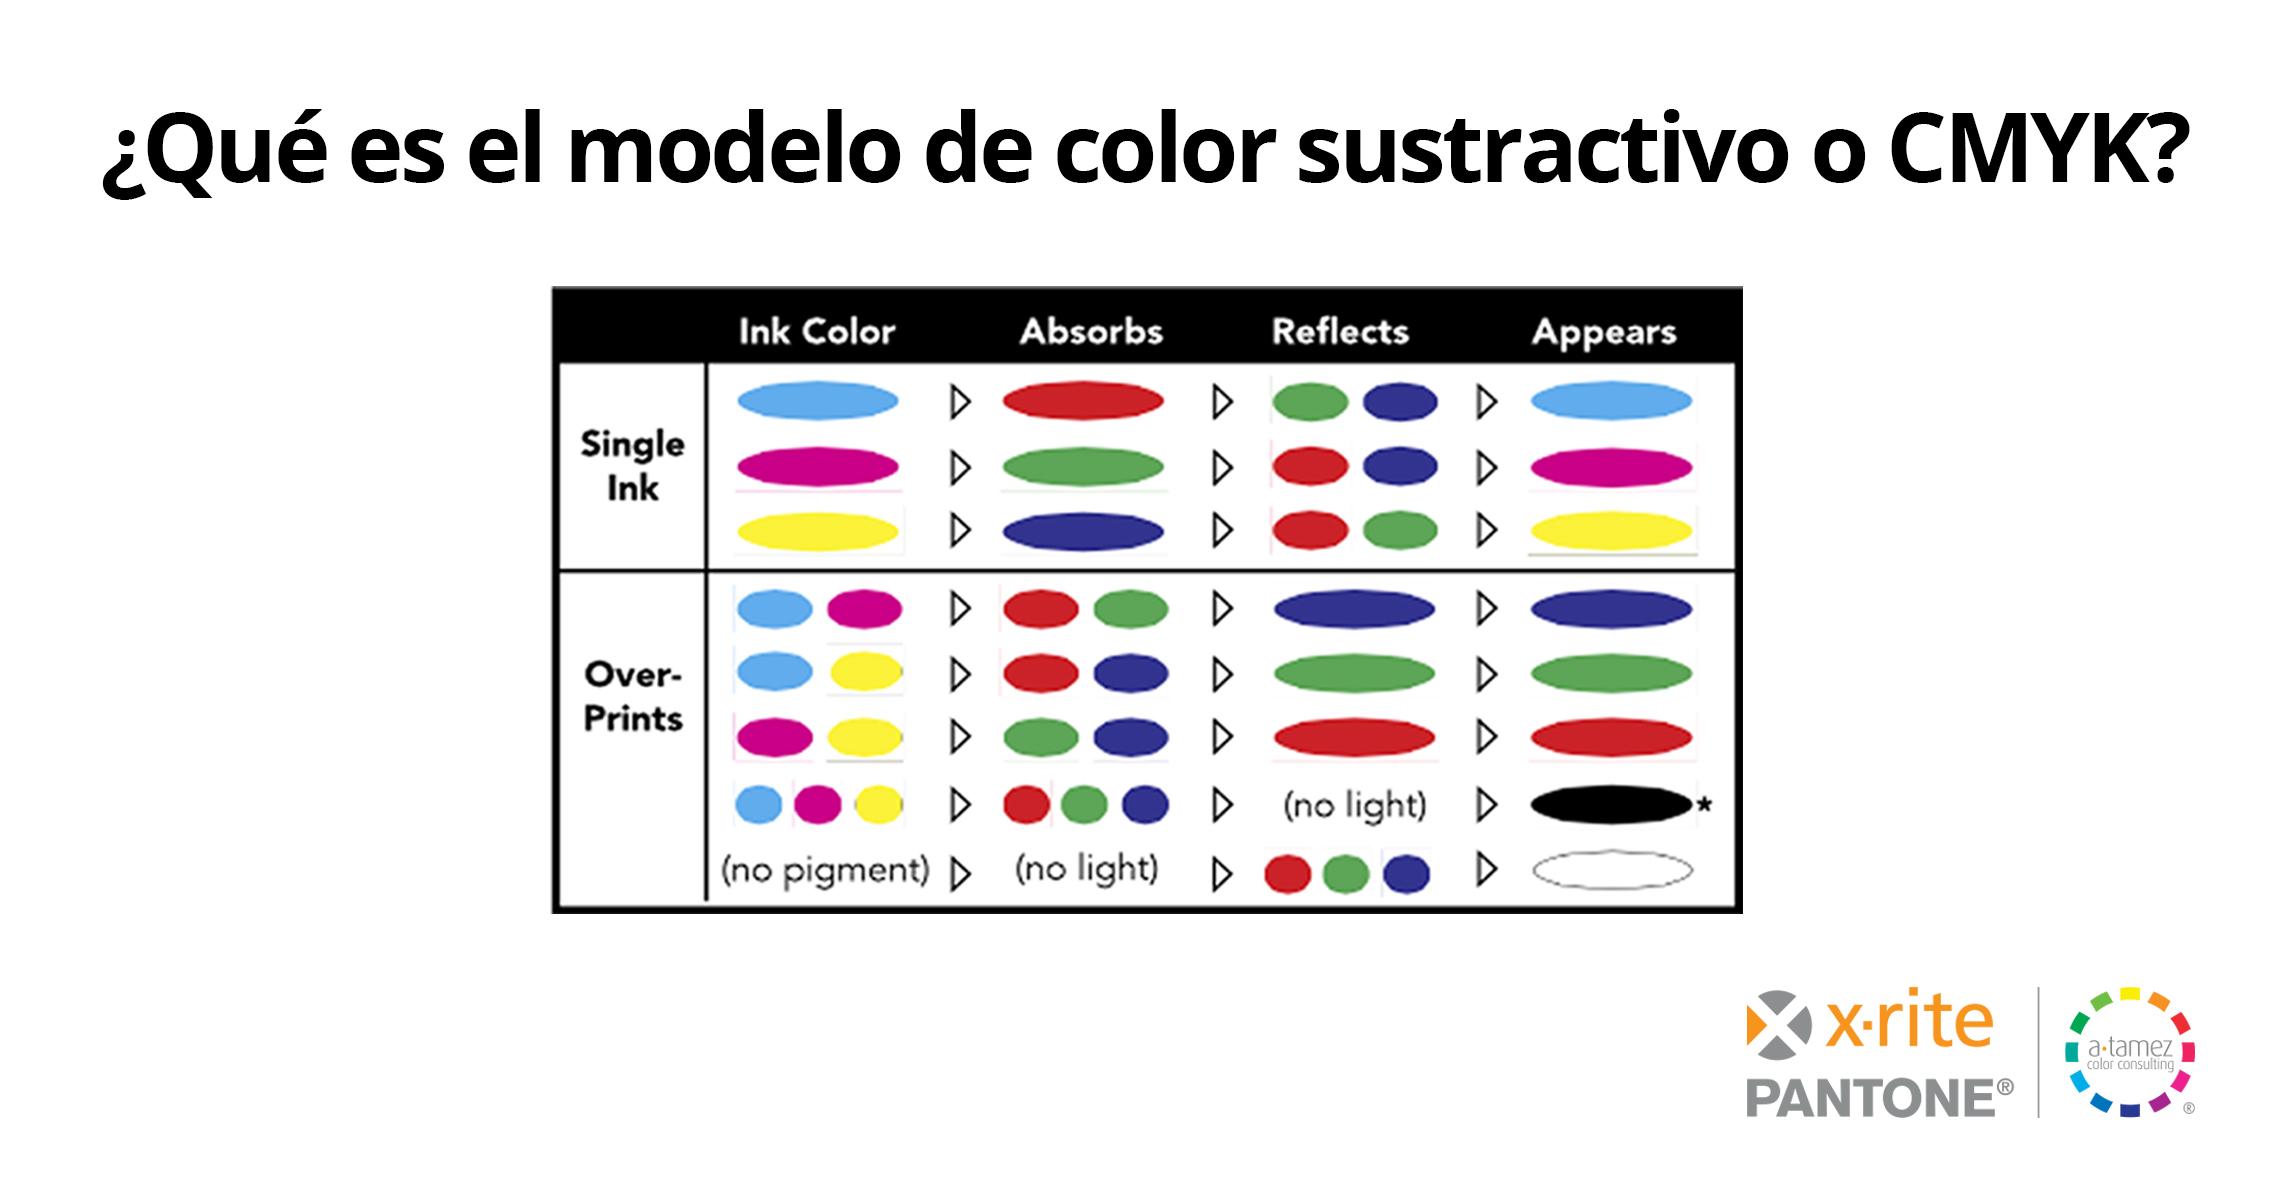 X-Rite Color Sustractivo Blog